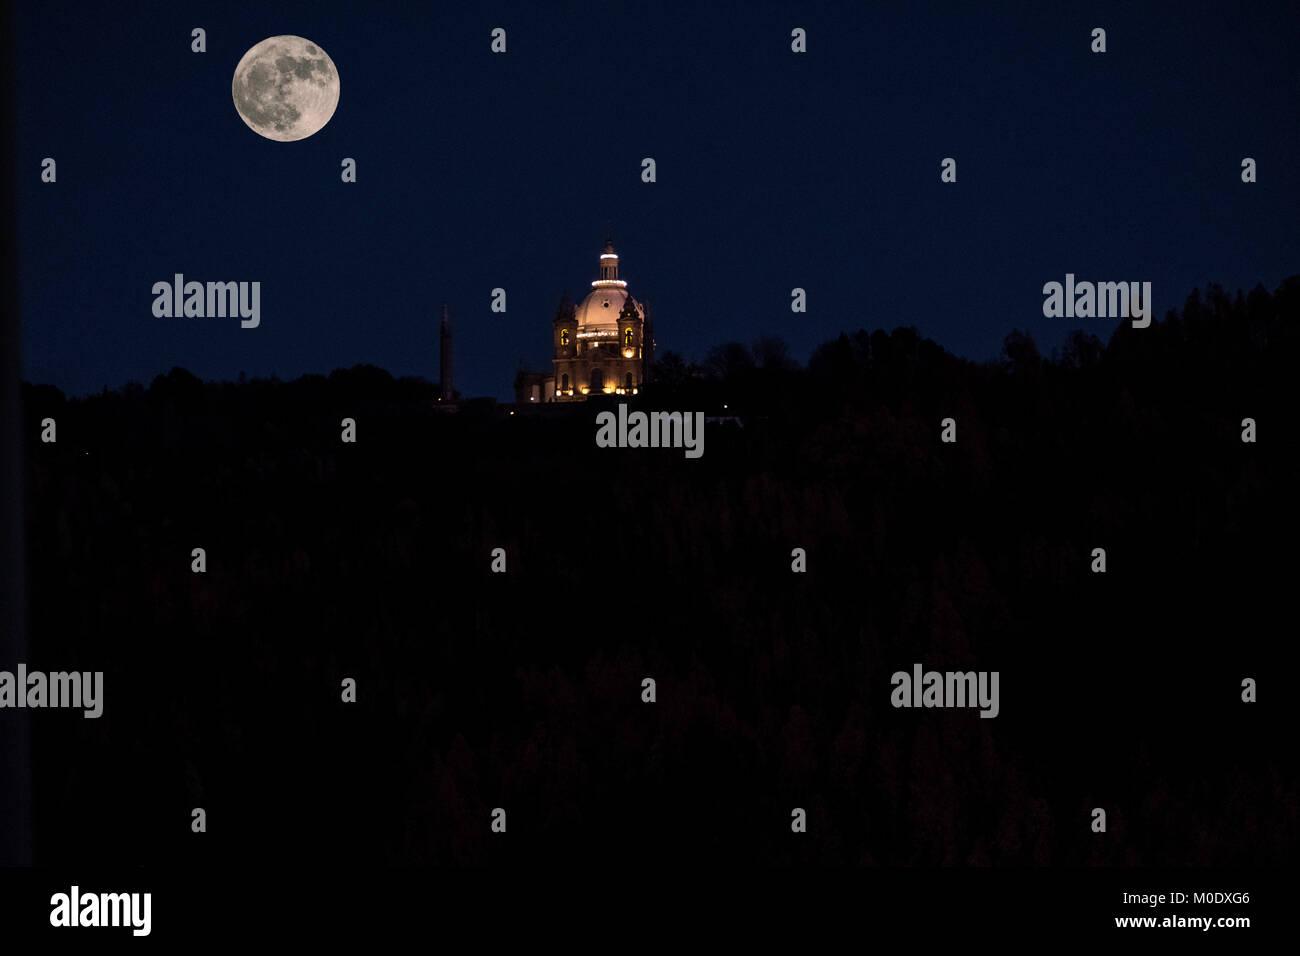 Super moon rising over the sanctuary of Sameiro in Braga, Portugal - Stock Image